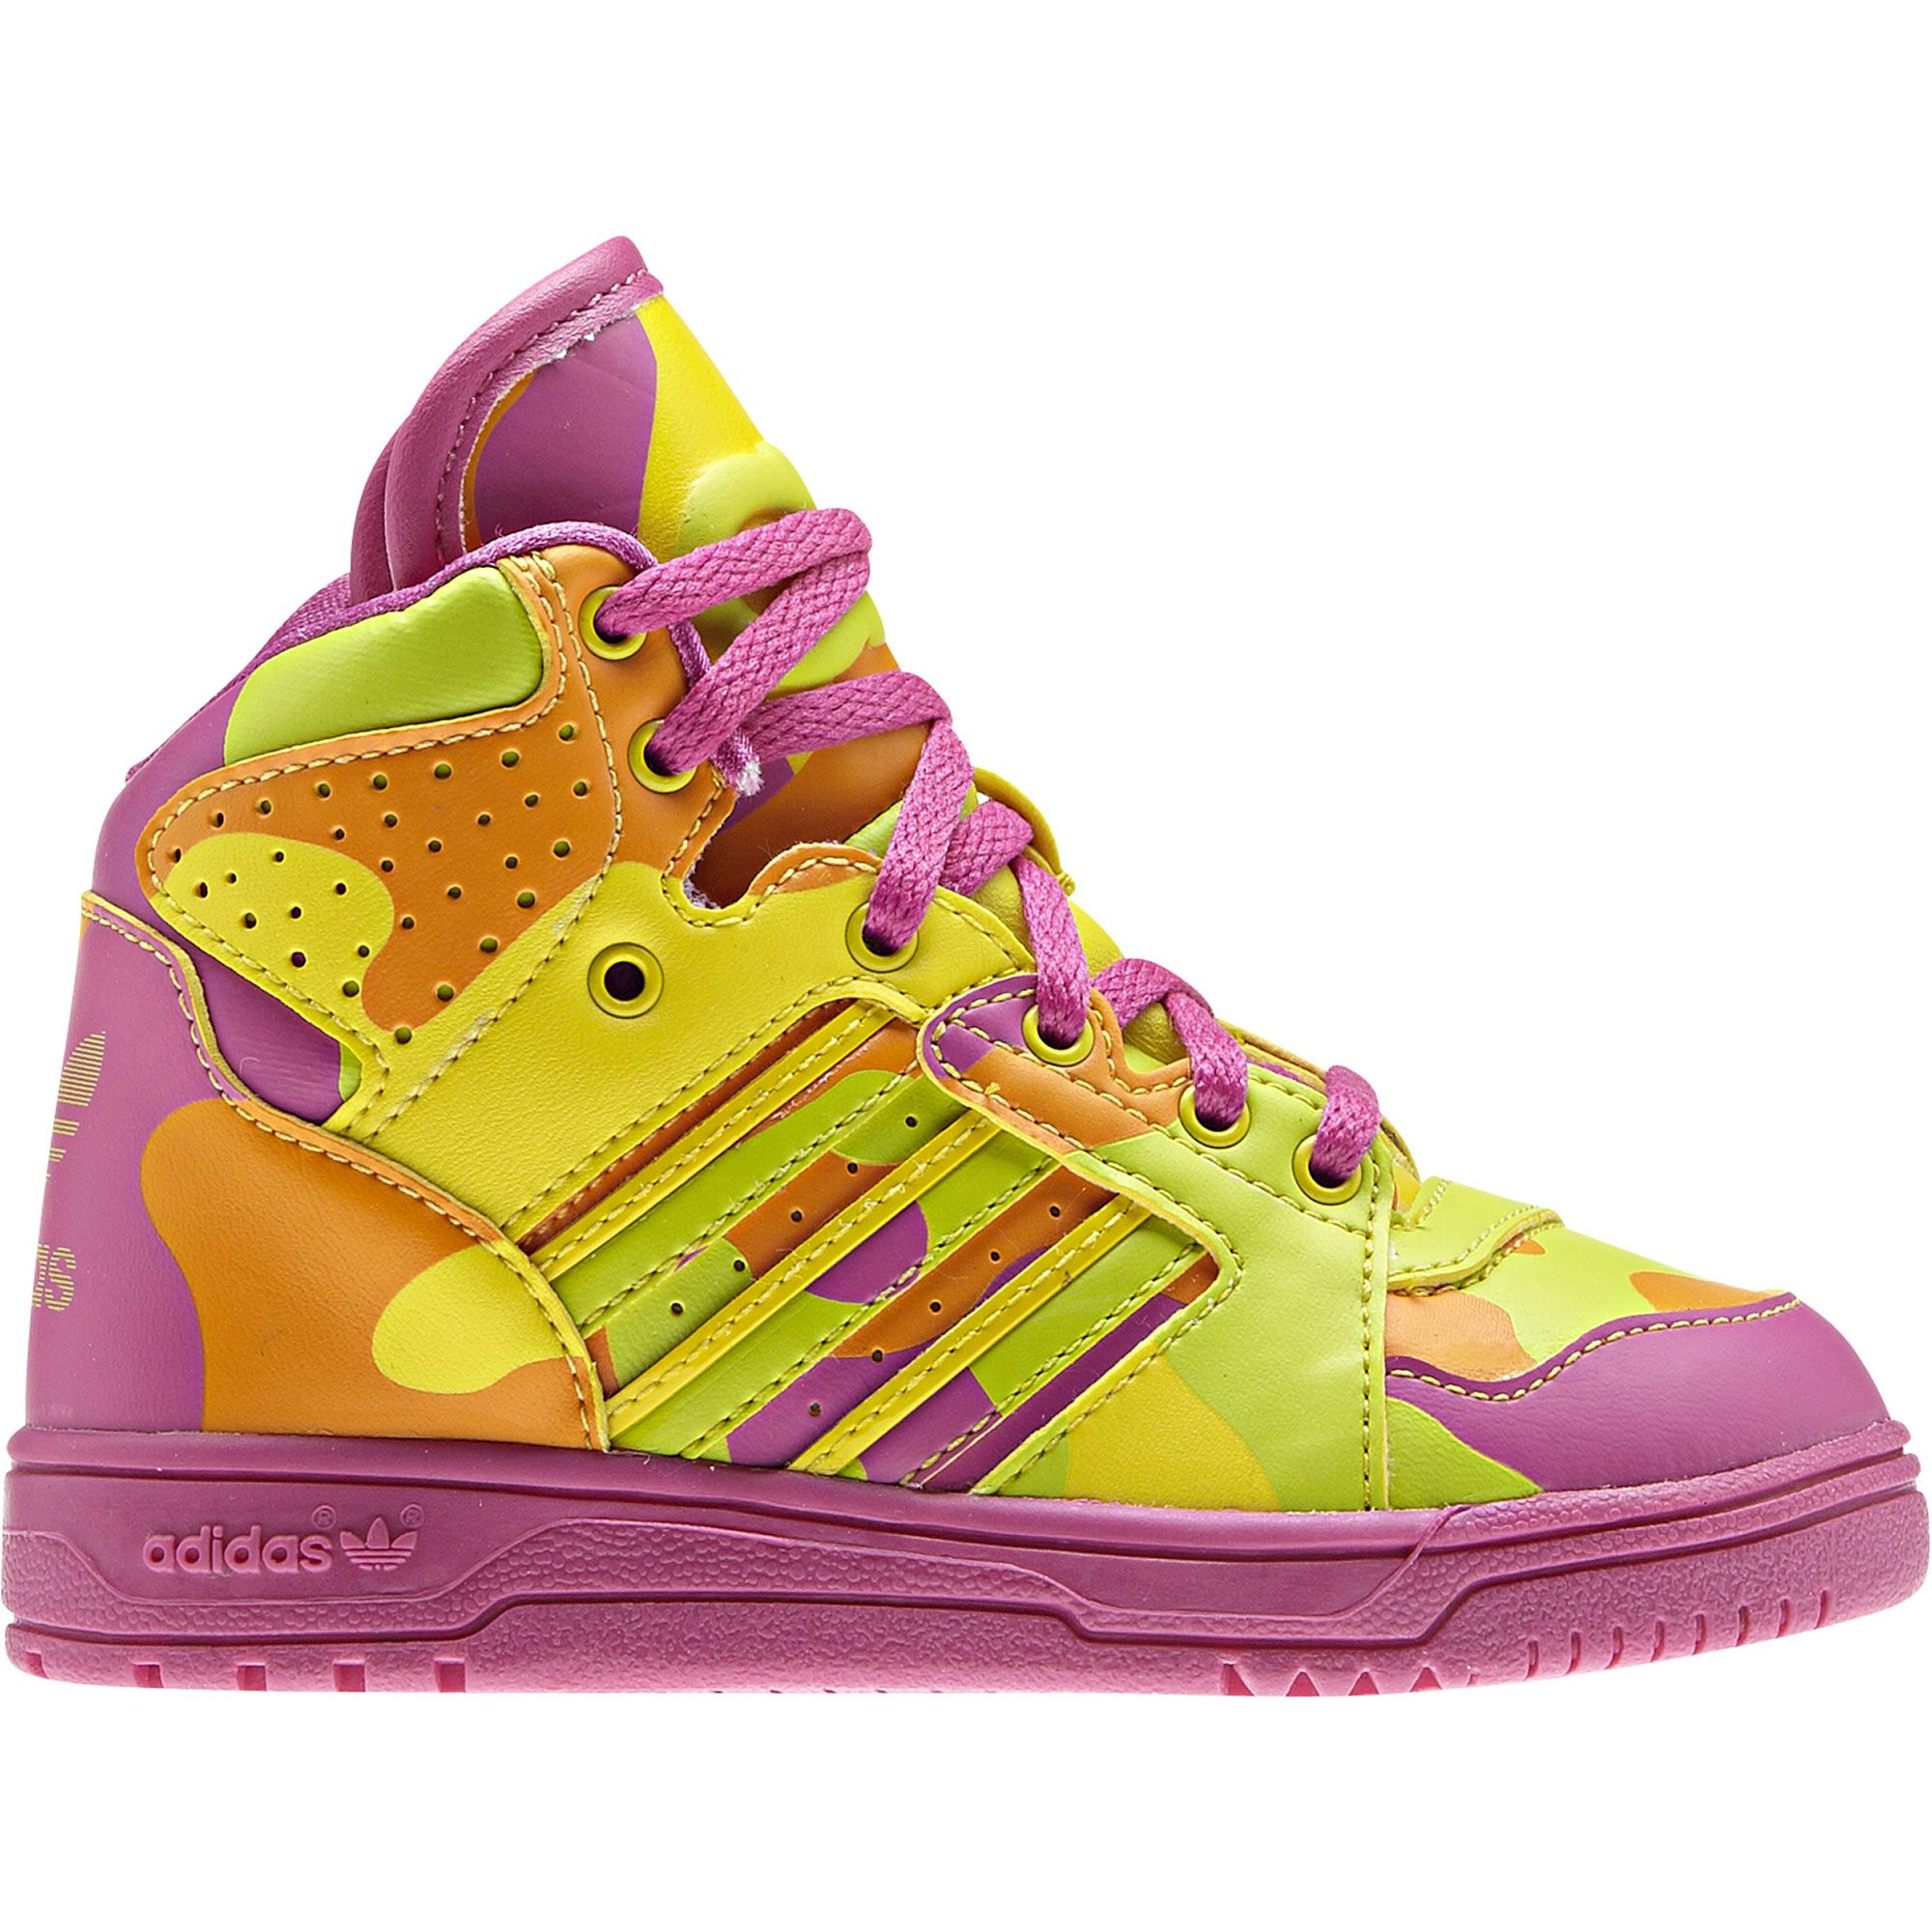 adidas Kids Instinct Hi Neon Camo Shoes adidas UK (met